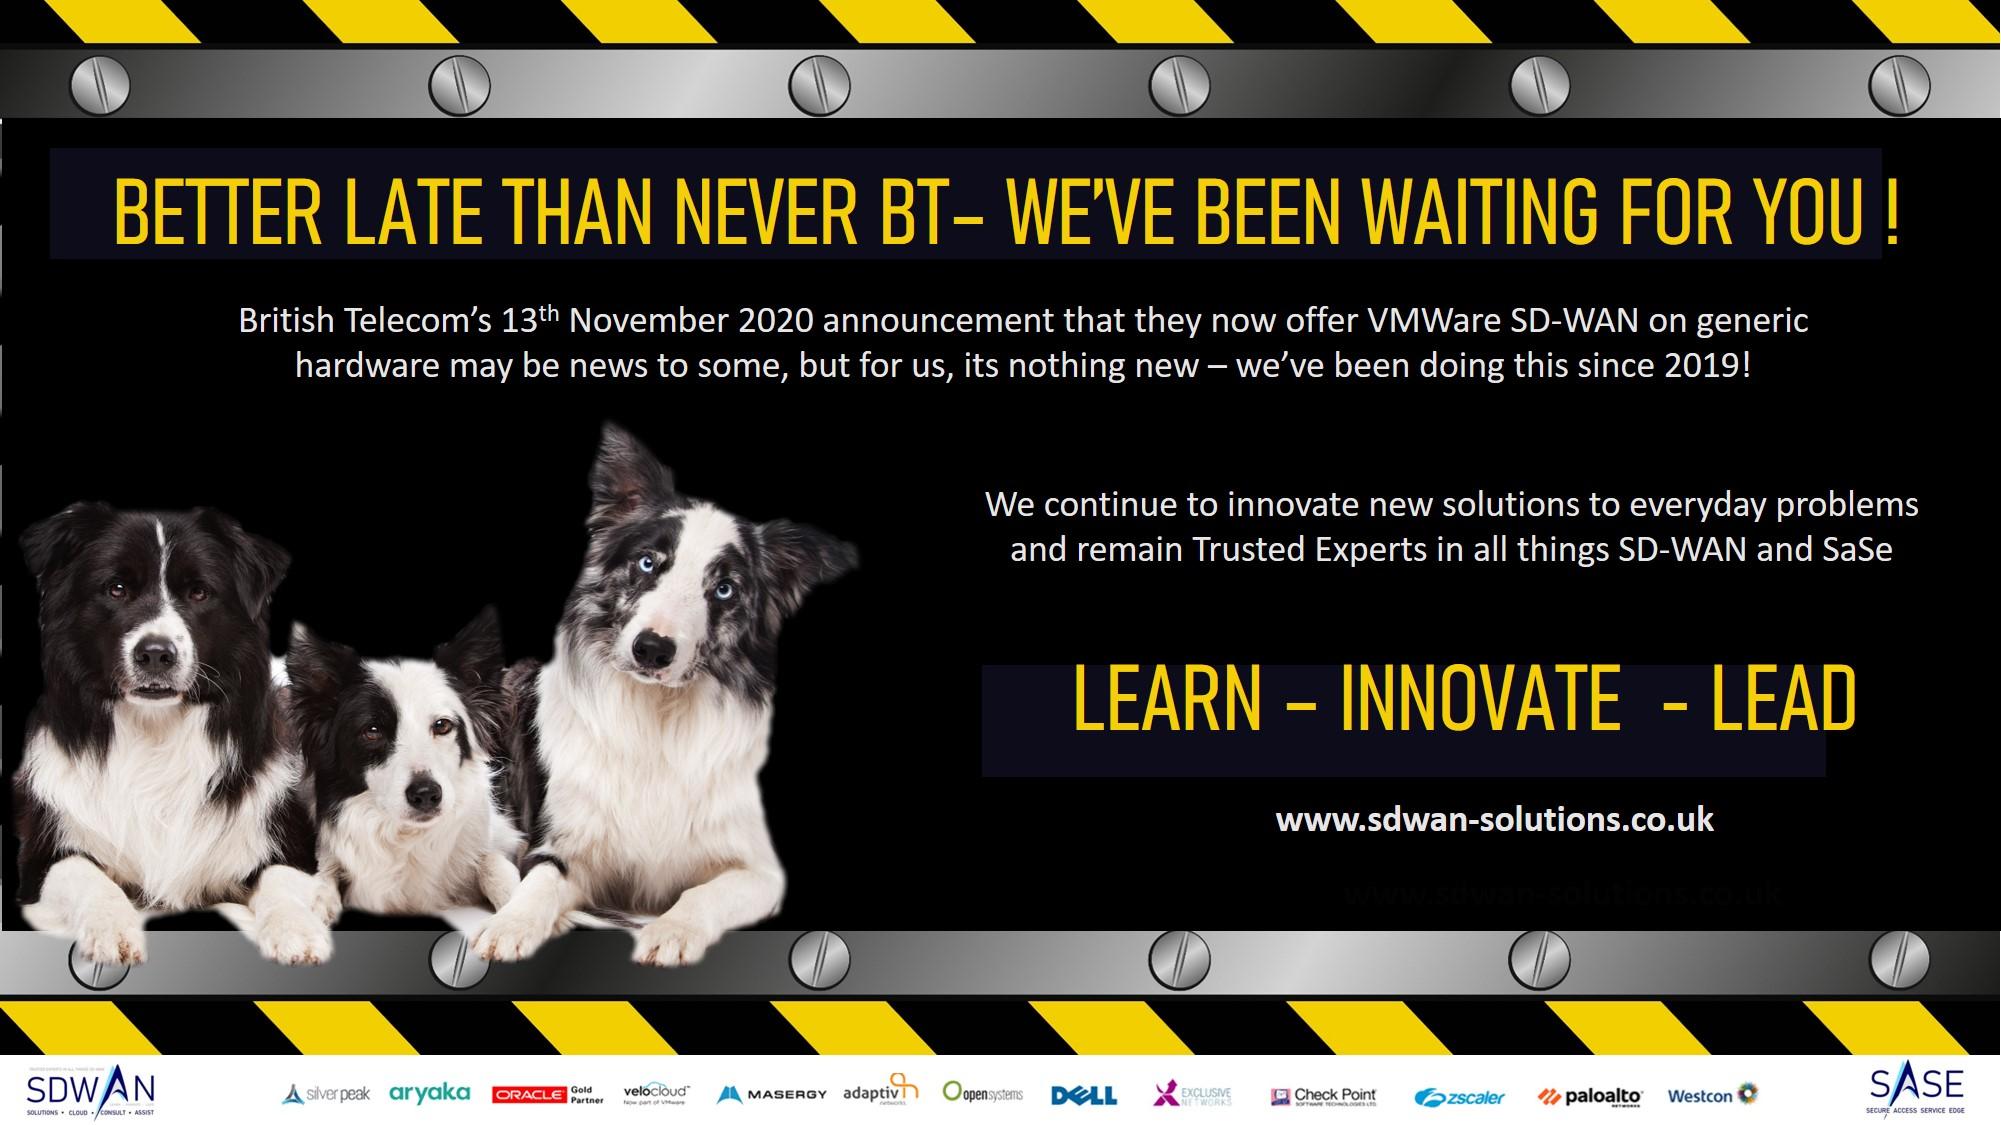 SDWAN Solutions innovation 2 years ahead of BT